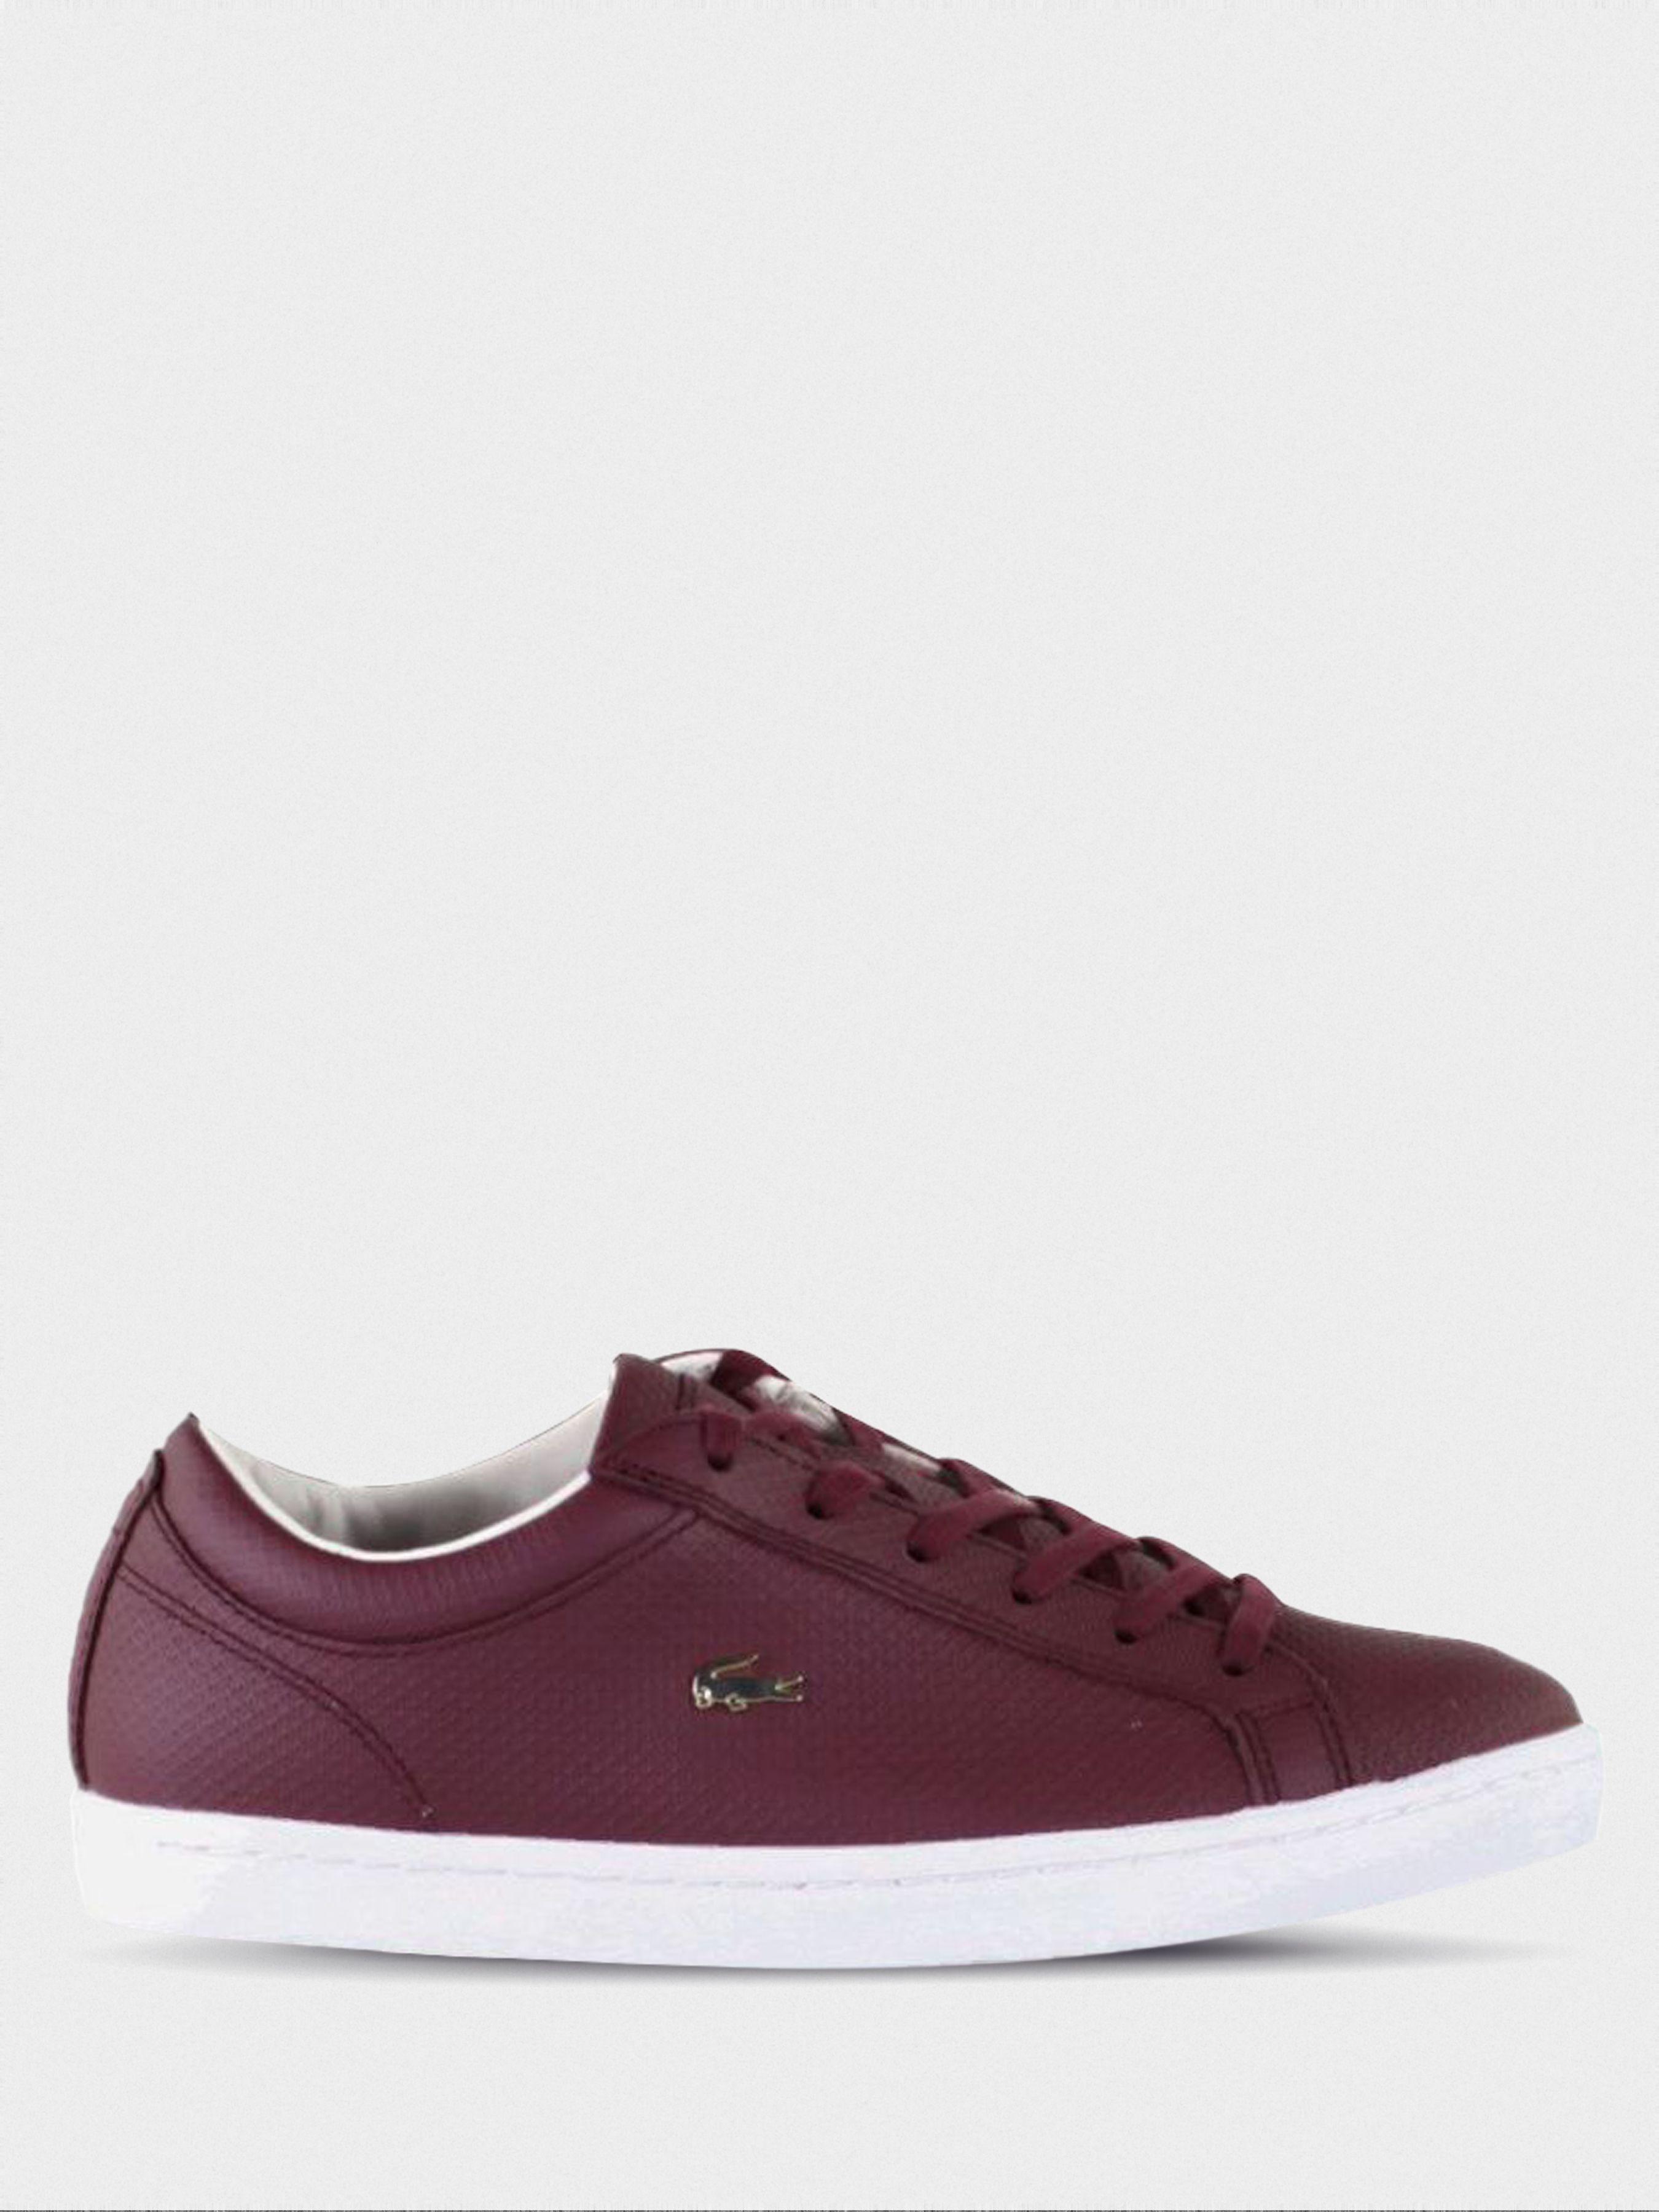 Полуботинки для женщин Lacoste Straightset 316 3 LL122 брендовая обувь, 2017